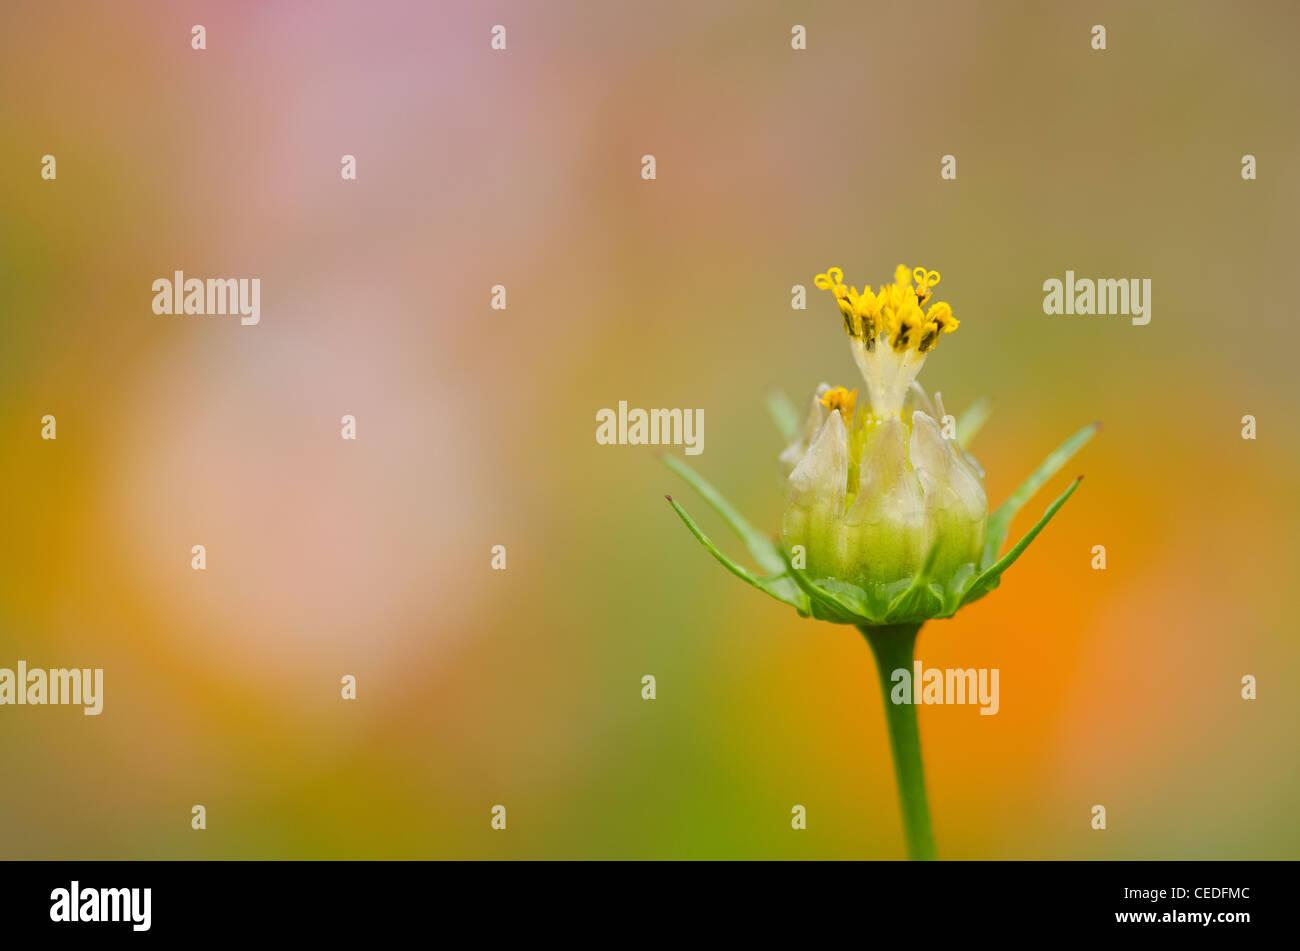 Close up of a single fading cosmos flower, Cosmos bipinnatus - Stock Image